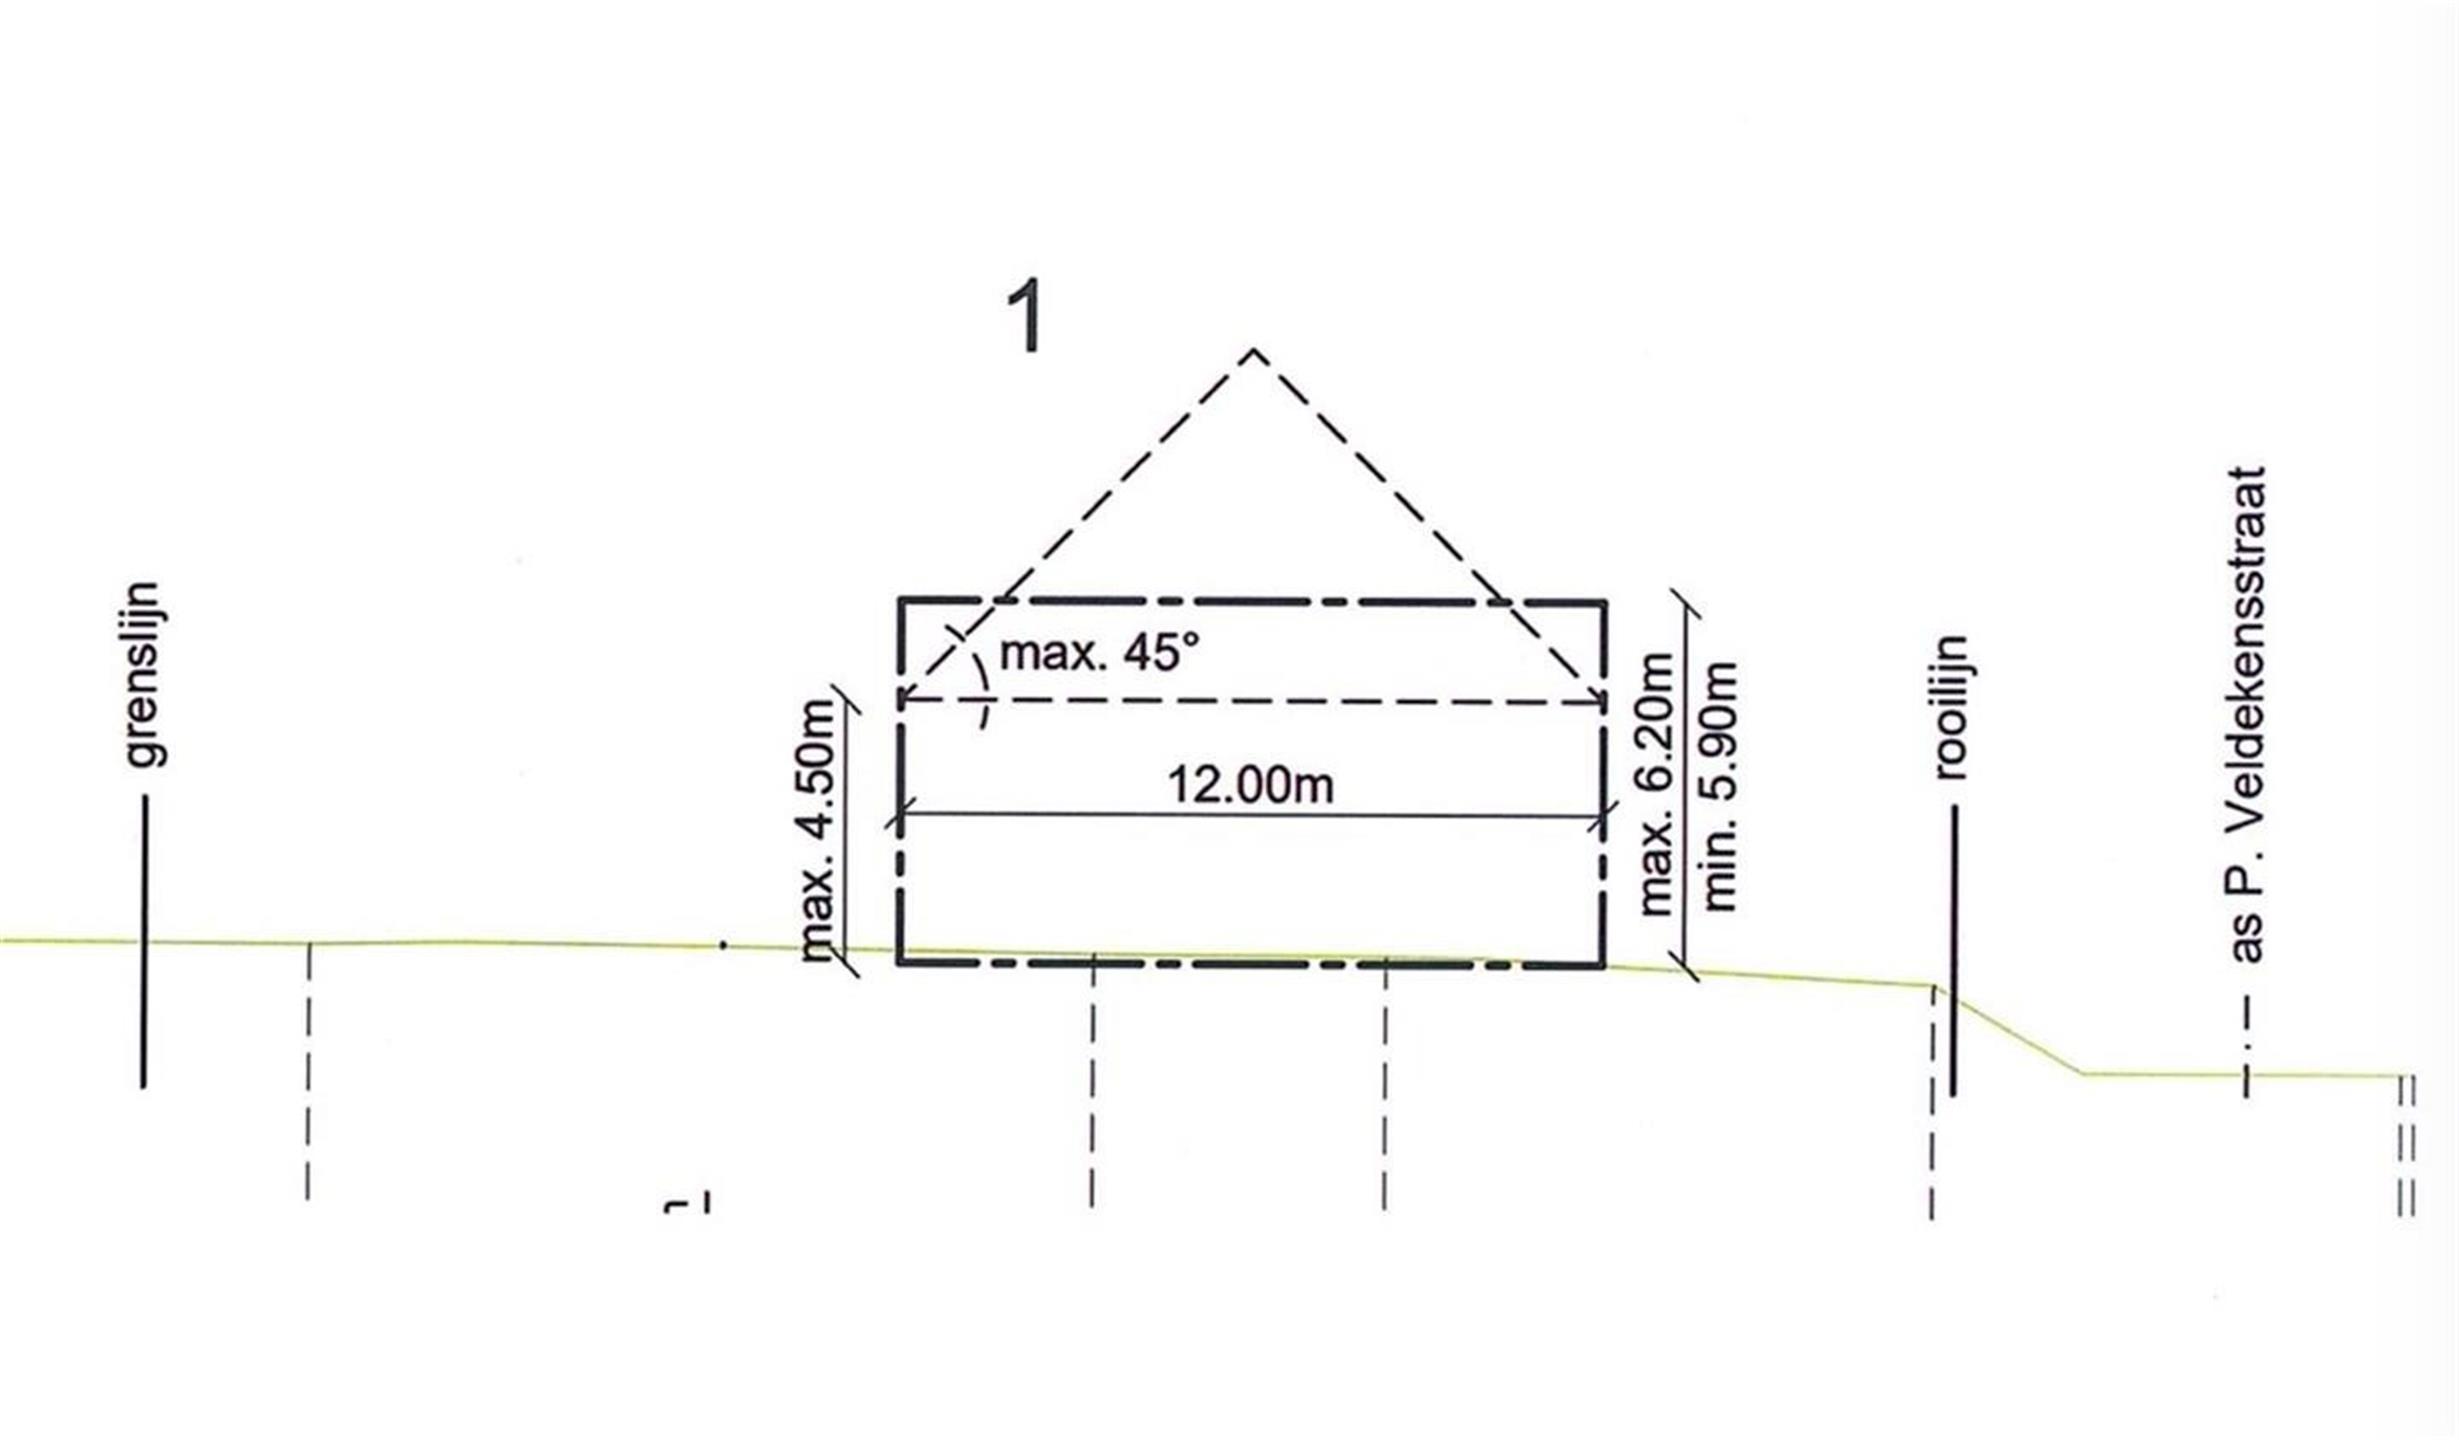 Terrain à bâtir - Sint-Pieters-Leeuw - #4238882-2